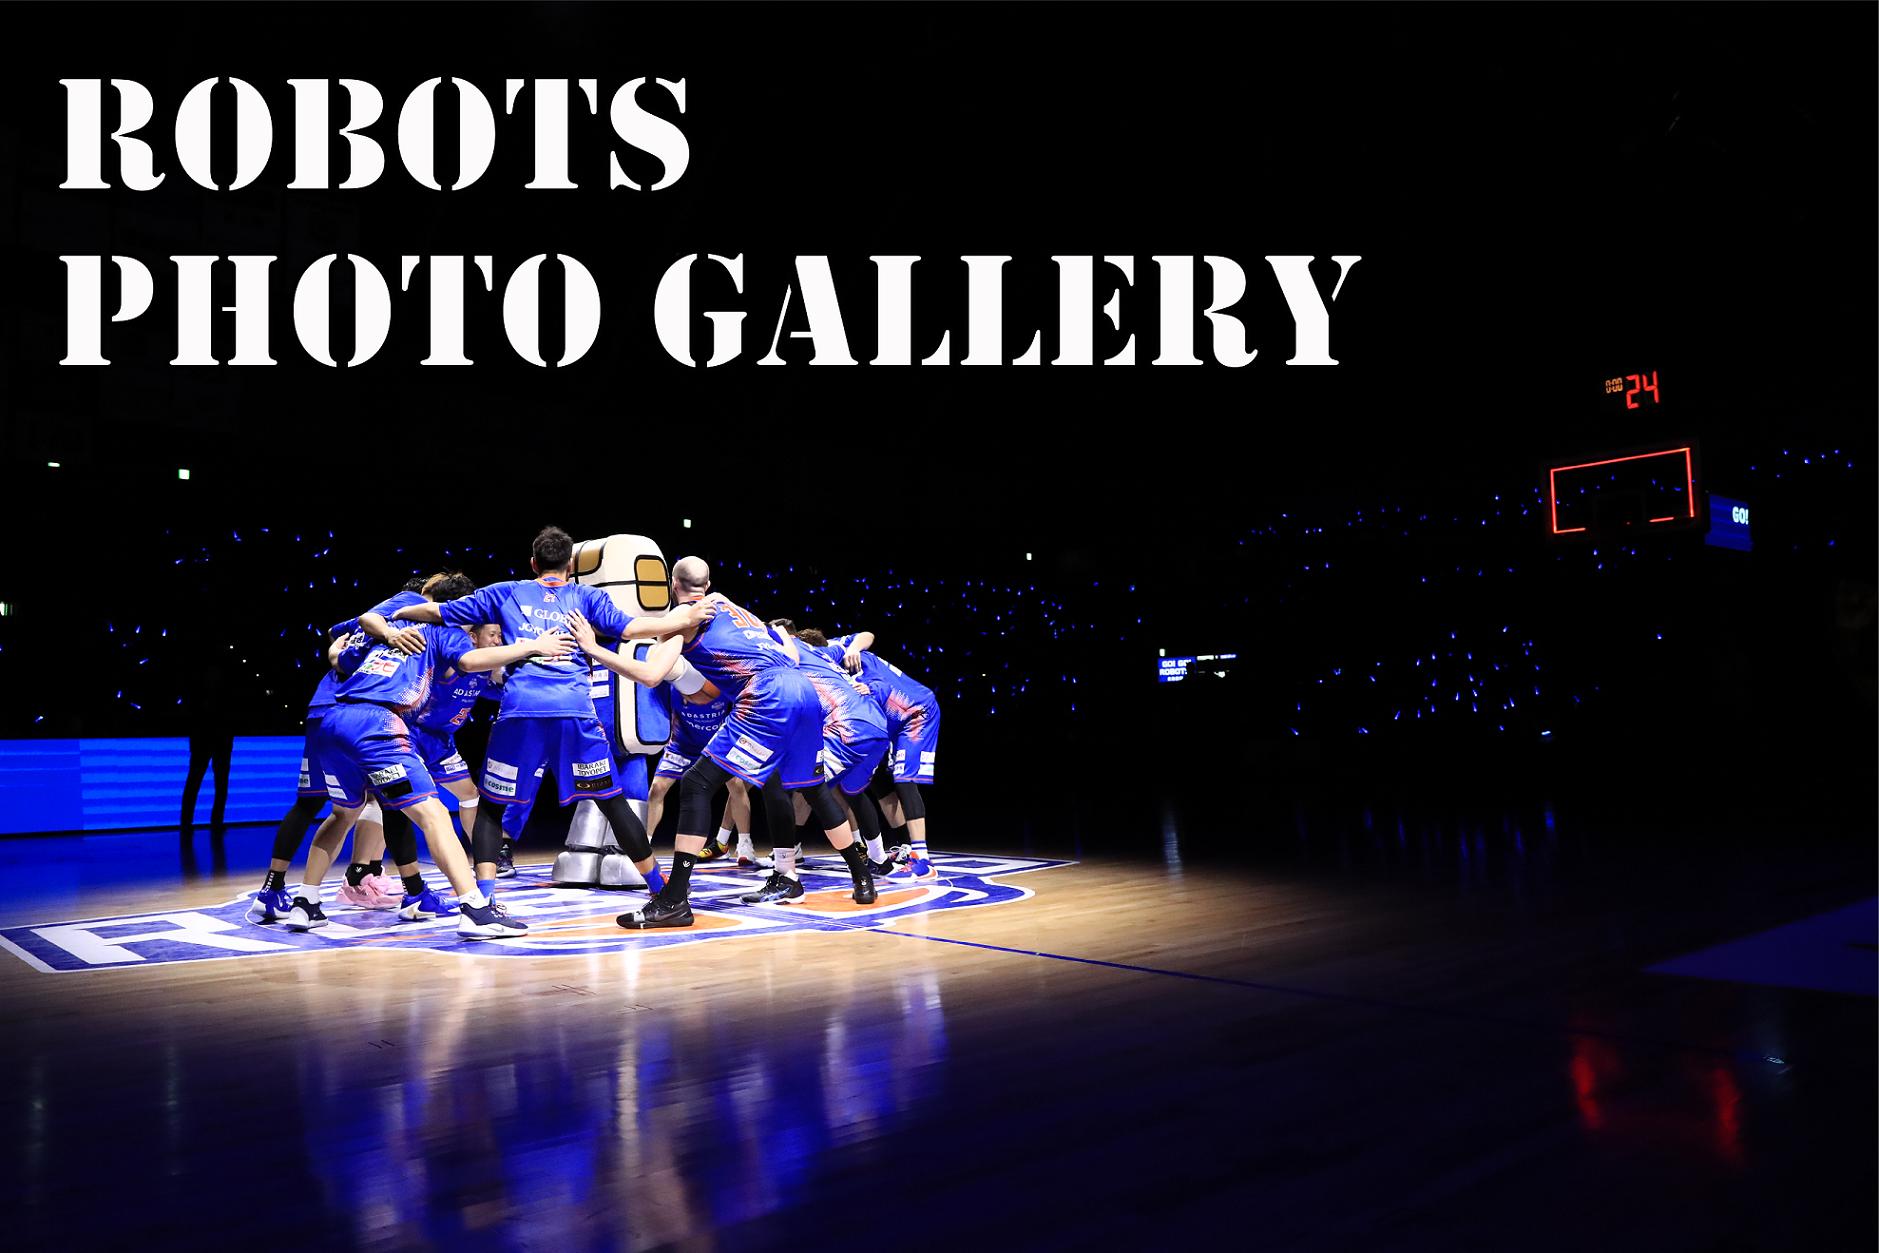 『ROBOTS PHOTO GALLERY』 2019-20シーズン 第23節 vs.Fイーグルス名古屋